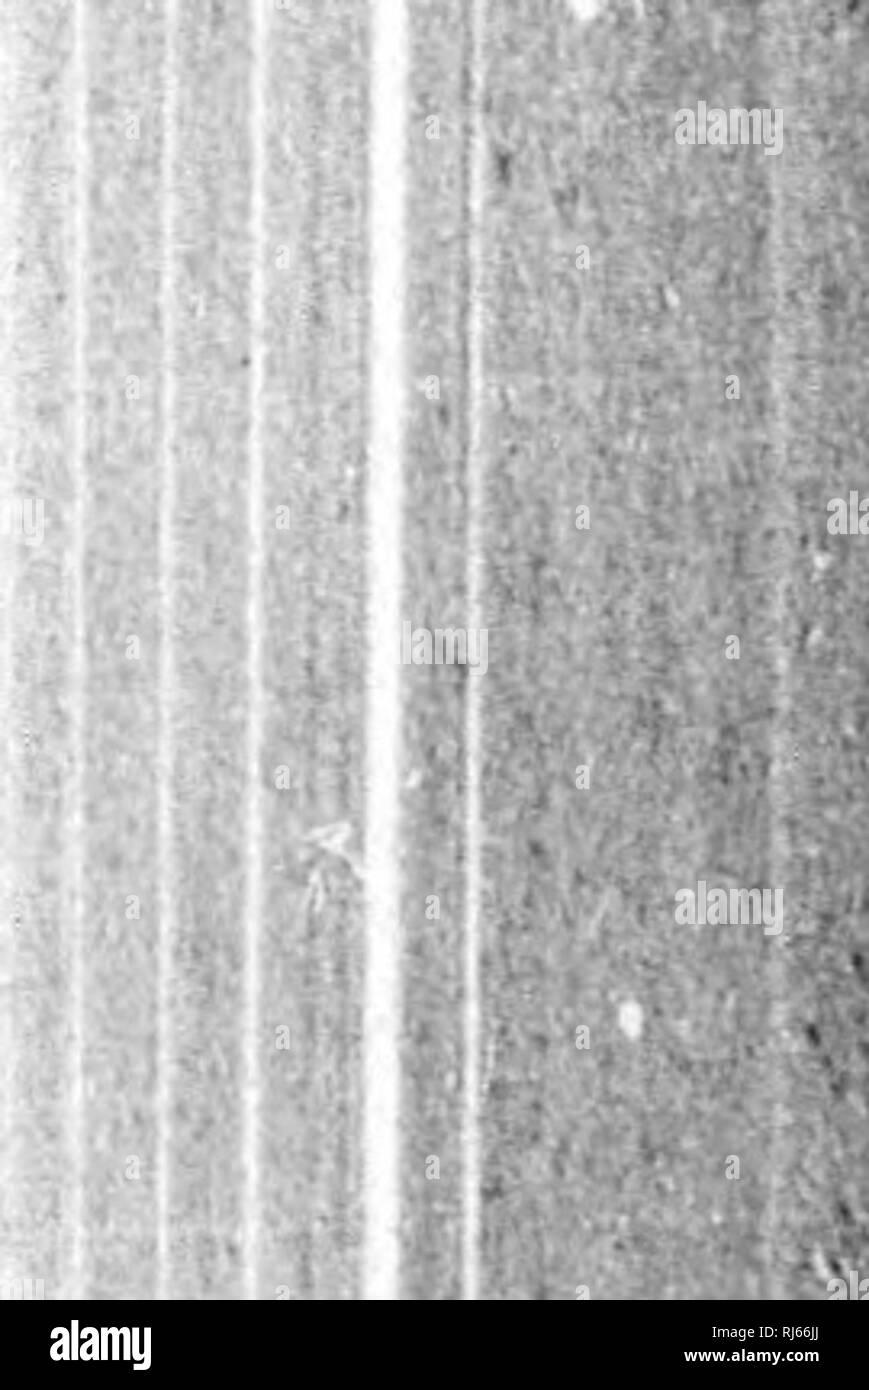 ". The water birds of North America [microform]. Birds; Water-birds; Oiseaux; Oiseaux aquatiques. LAHID.K âTllK (JILI.S ANH TKHNS â RISSA. '20] Rissa breviroBtris. THE SEO-LEGOED KITTIWAKE. Einsn Hi'nvT, (""Jray, (umi. B. 111. 184') (tint of Talias, IS'Jti). I.awk. in Hainrs H. Jf. Am. IS.IS S;').'!. â KLi.mr, lllnstr. Am. 11. pi. ;>i. Ijinis Imu-liifrliimcliiut, Ooim.p, 1*. Z. S. 184;?, lOii; Zool. Voy. SiiliOi. r>0, pi. ;U (not of liuiiAKHsos, 1831). Lini.i {liiss(i) liivriivstn'.i, "" lliiAMir,"" Hurcii, ,1. f. O. 18.'i;l, â¢.V'n;'). â Cm is, 11. N. W. I8;""t. (Hi. lUxA - Stock Image"